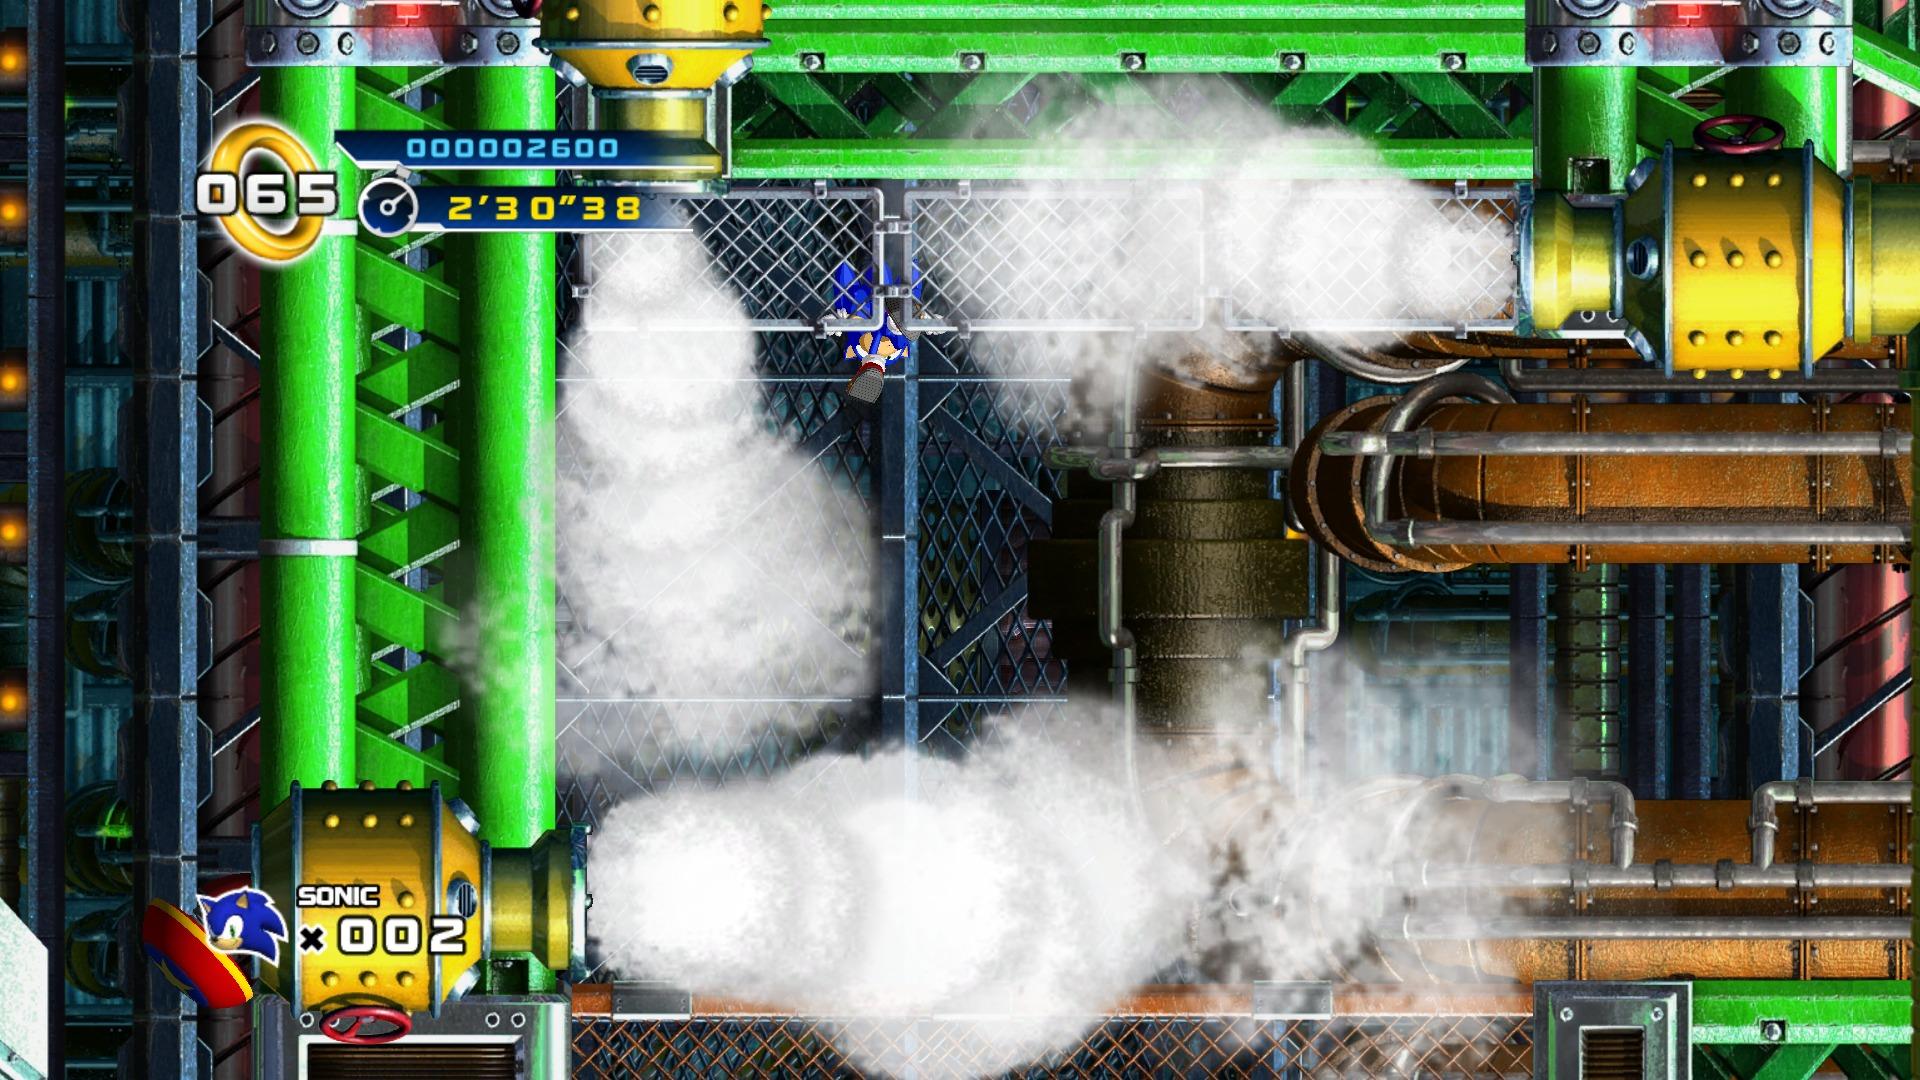 Sonic The Hedgehog 4 Episode 1 - Image 7